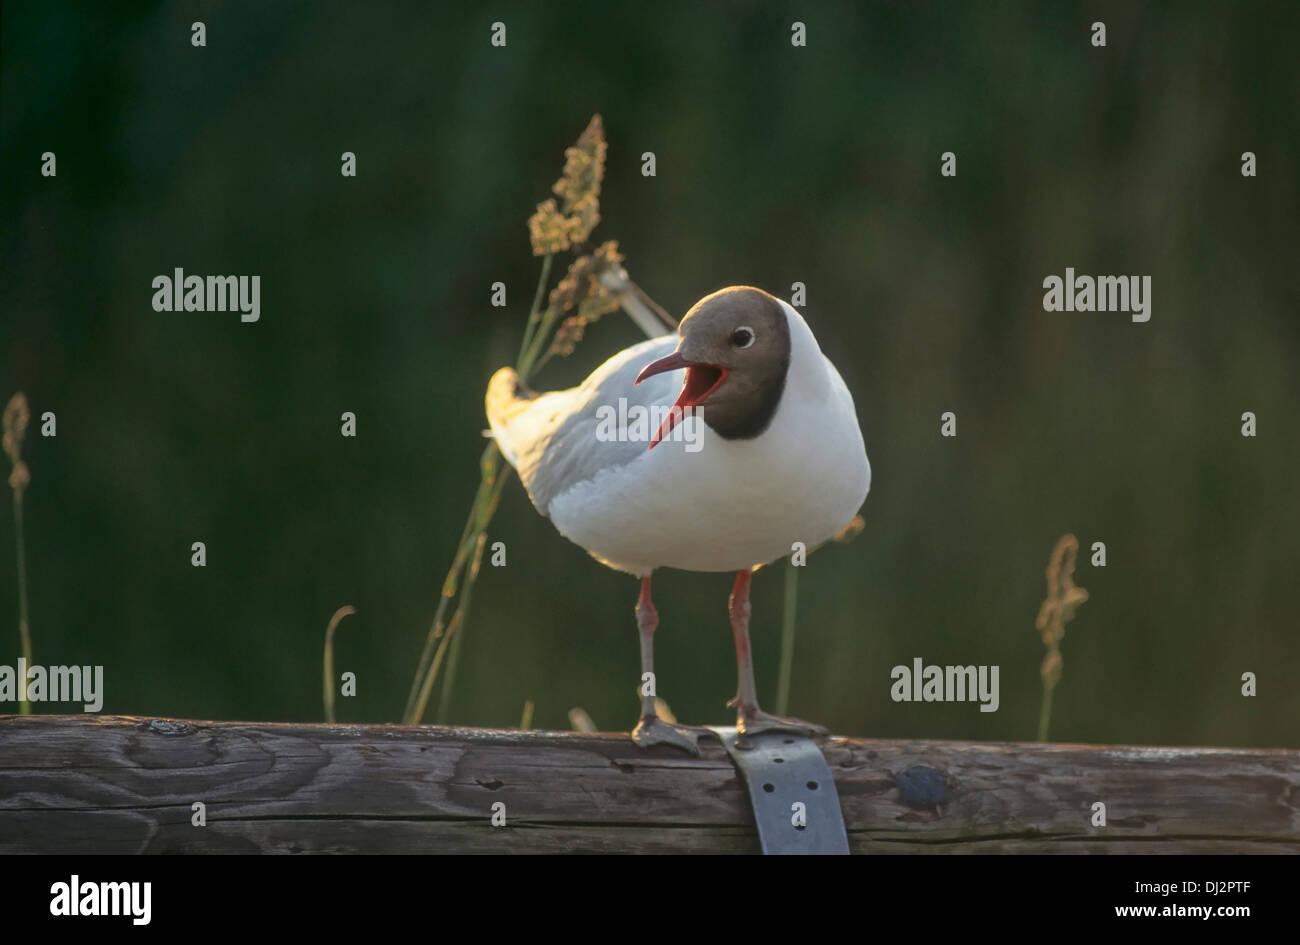 Black-headed Gull, Lachmöwe (Chroicocephalus ridibundus) - Stock Image